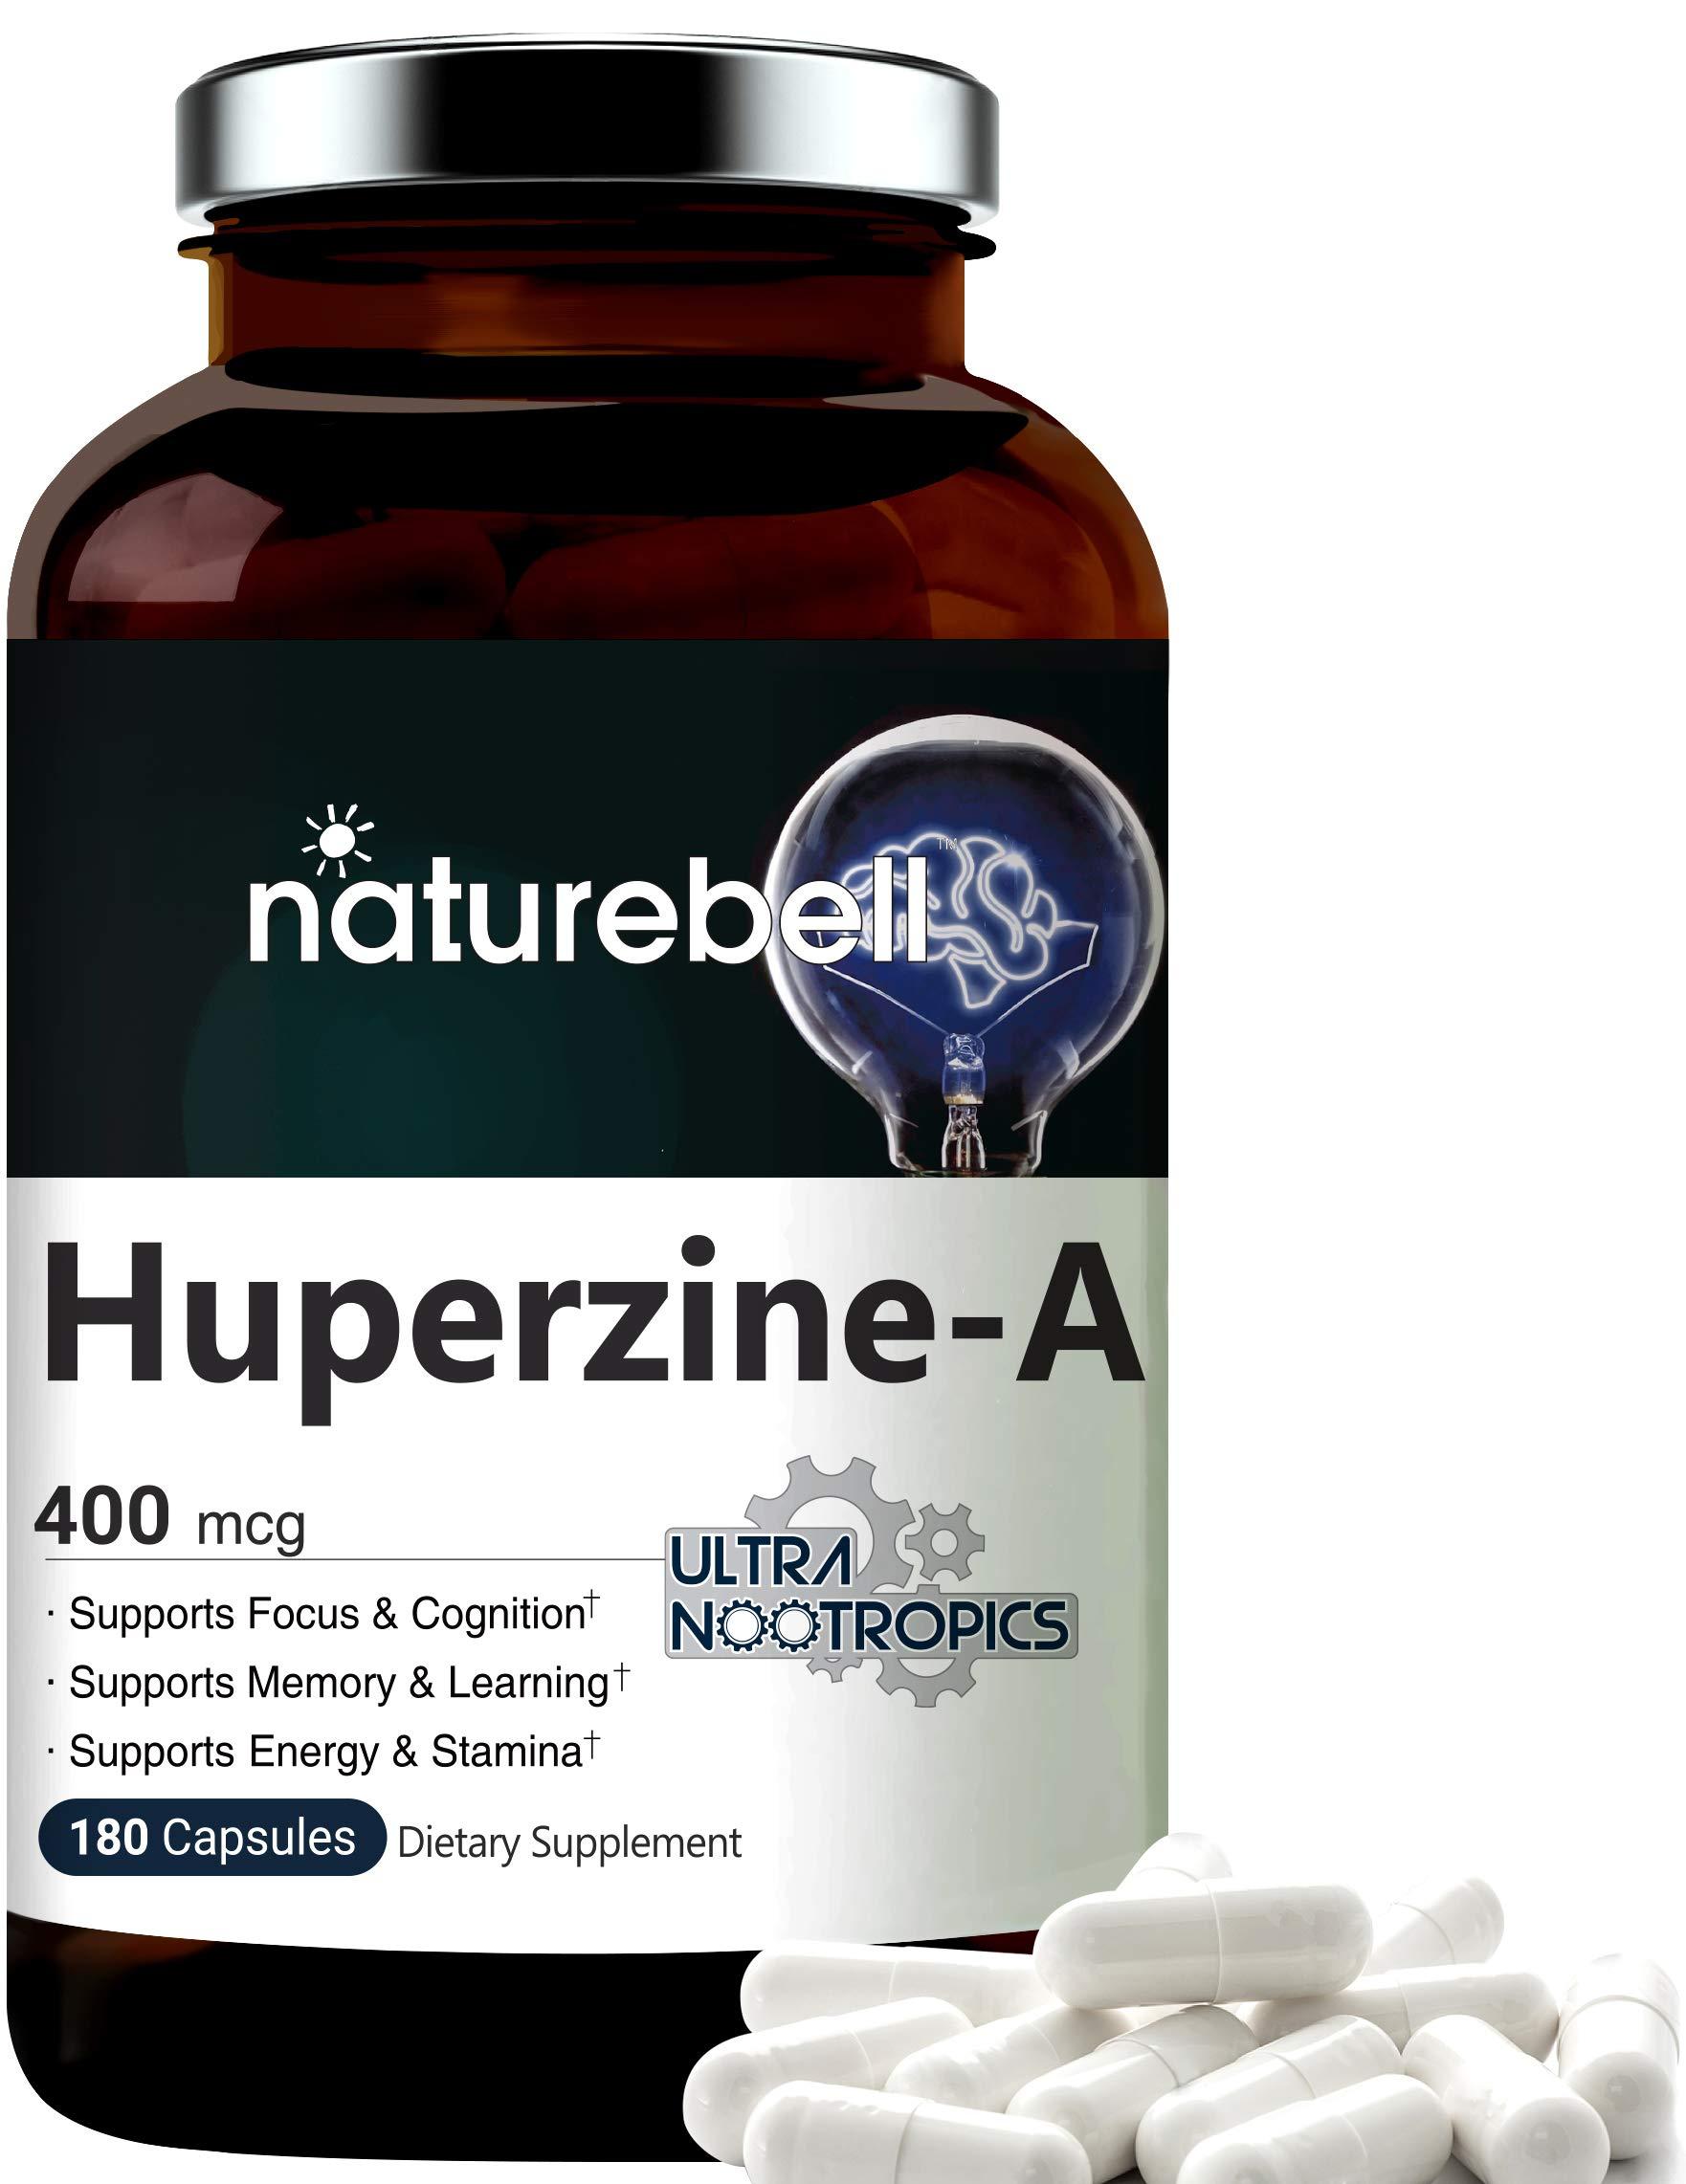 Huperzine A 400mcg Per Serving